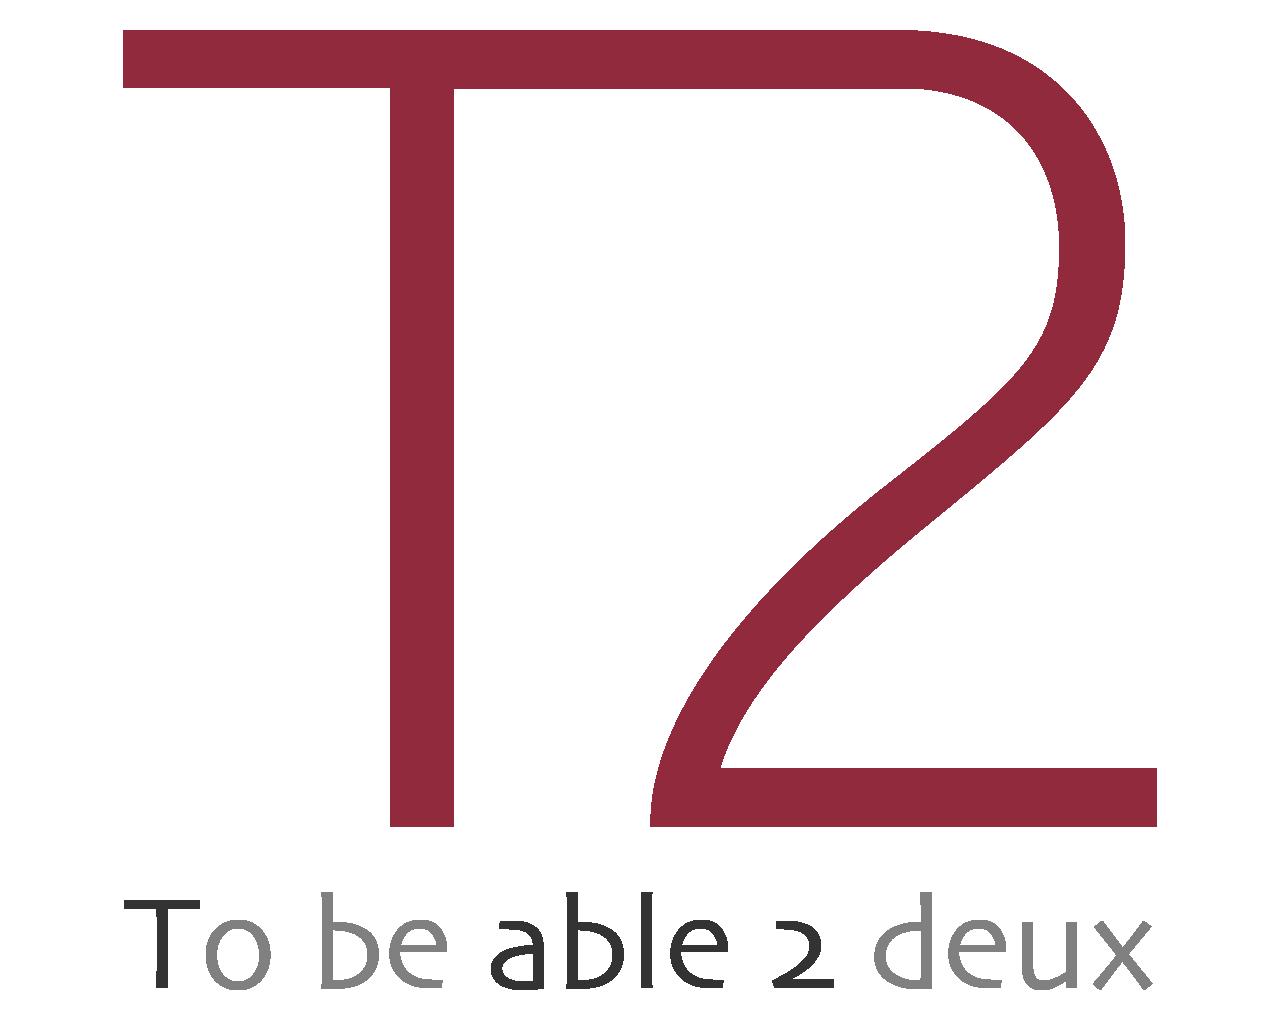 Table2-ターブルドゥー 刈谷市で飲食店を経営する会社の採用サイト